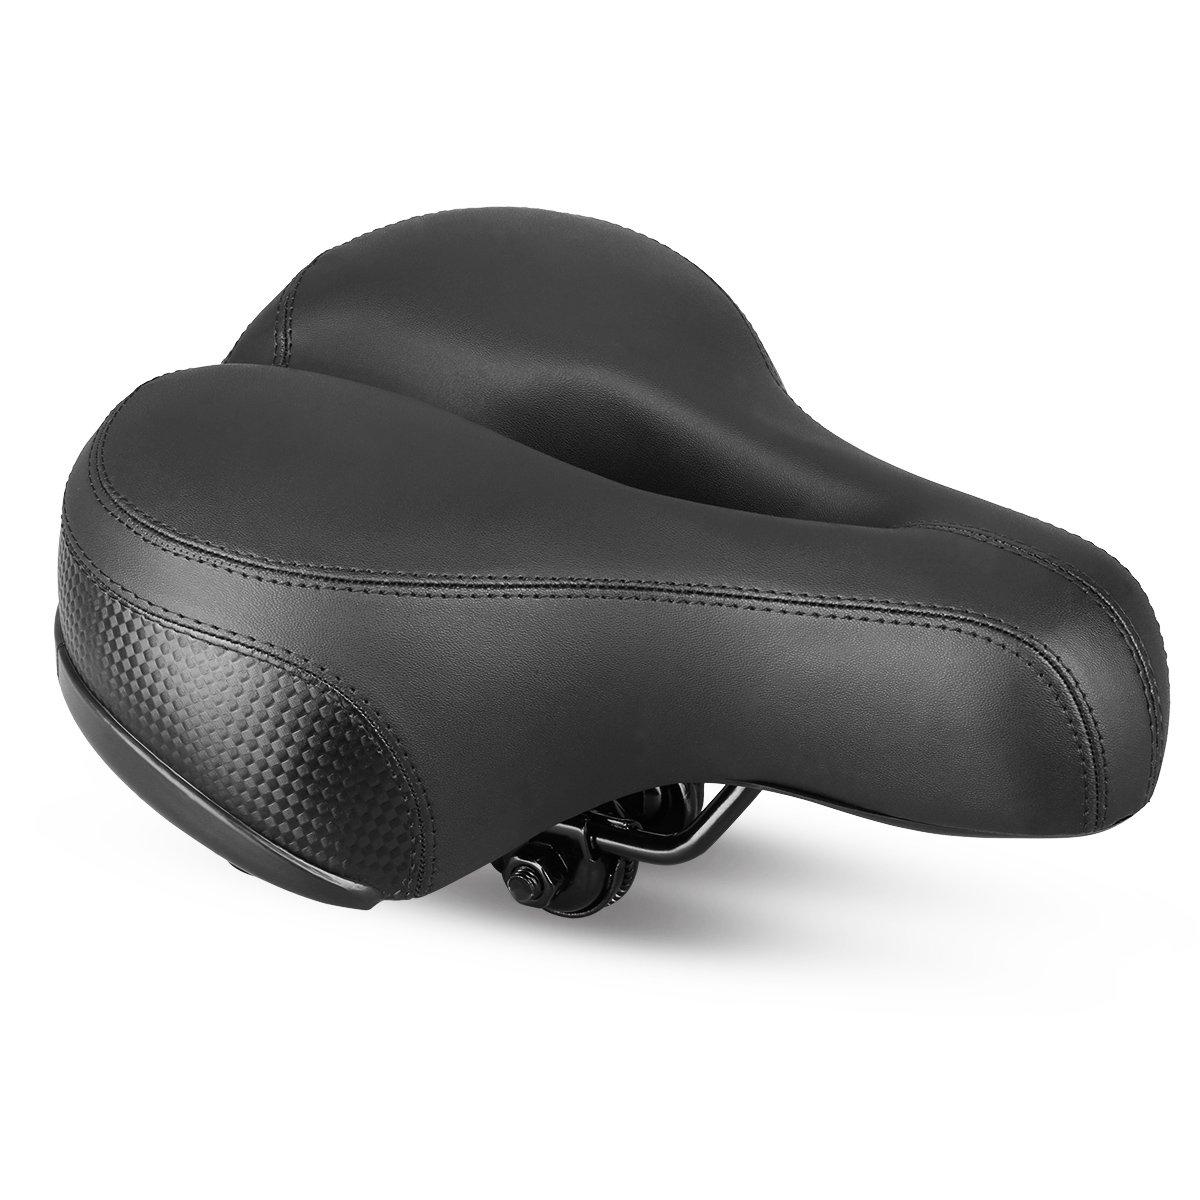 Techno Gel Wide End Comfort Gel Shock Absorbers Womens Bike Big Bum Saddle Black